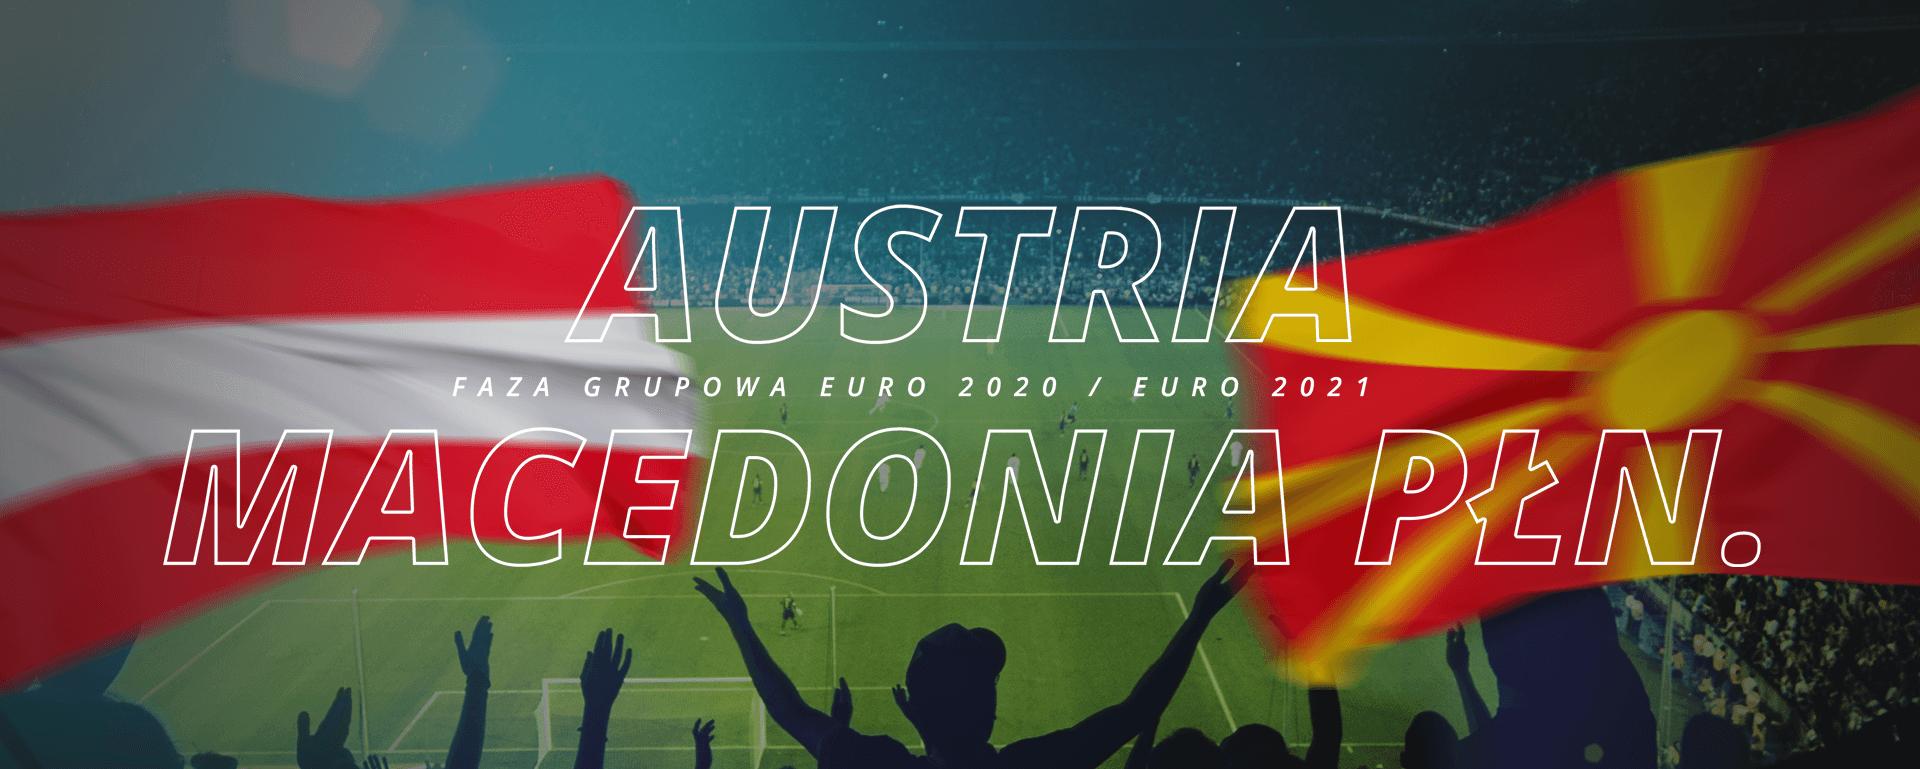 Austria – Macedonia Płn. | faza grupowa Euro 2020 / Euro 2021